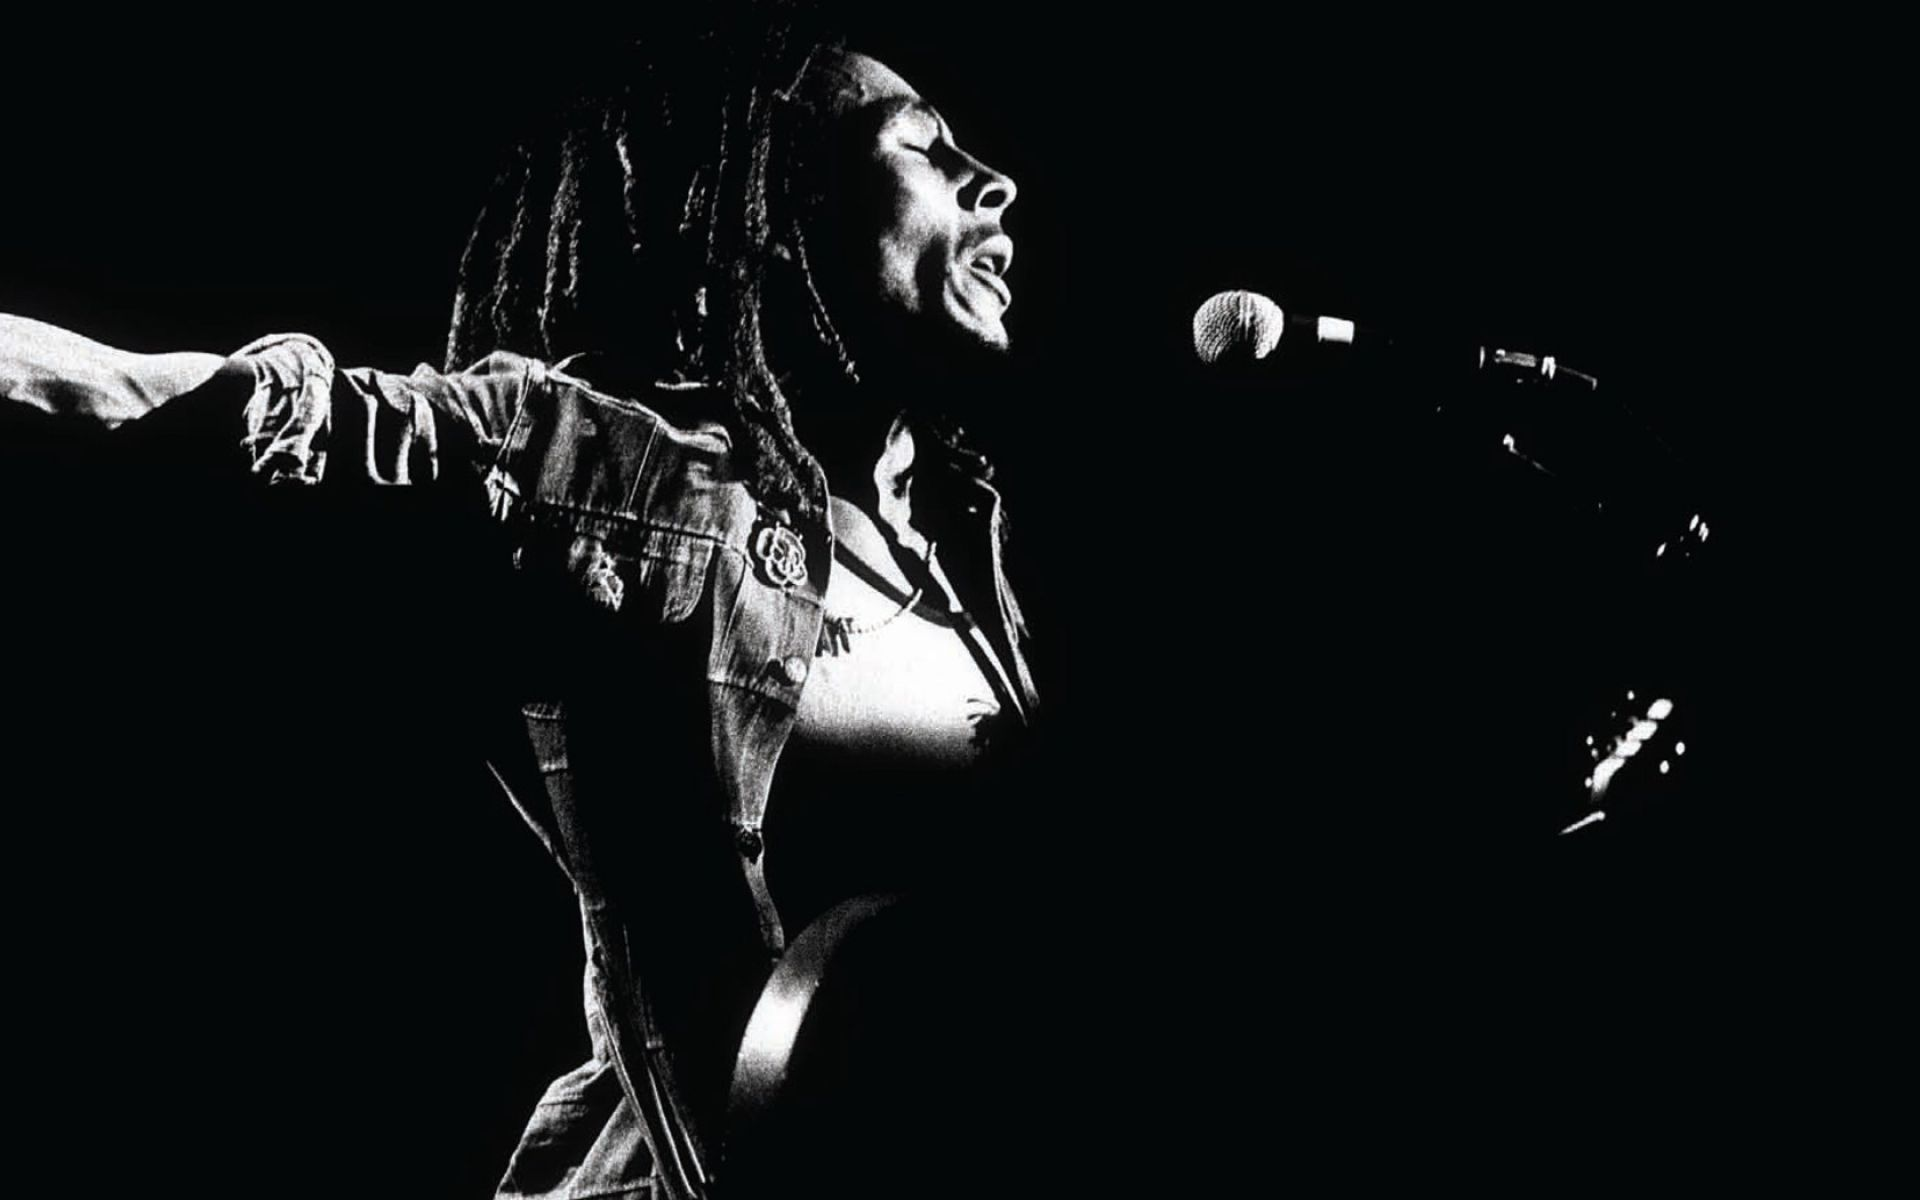 Bob Marley Black And White Wallpapers Top Free Bob Marley Black